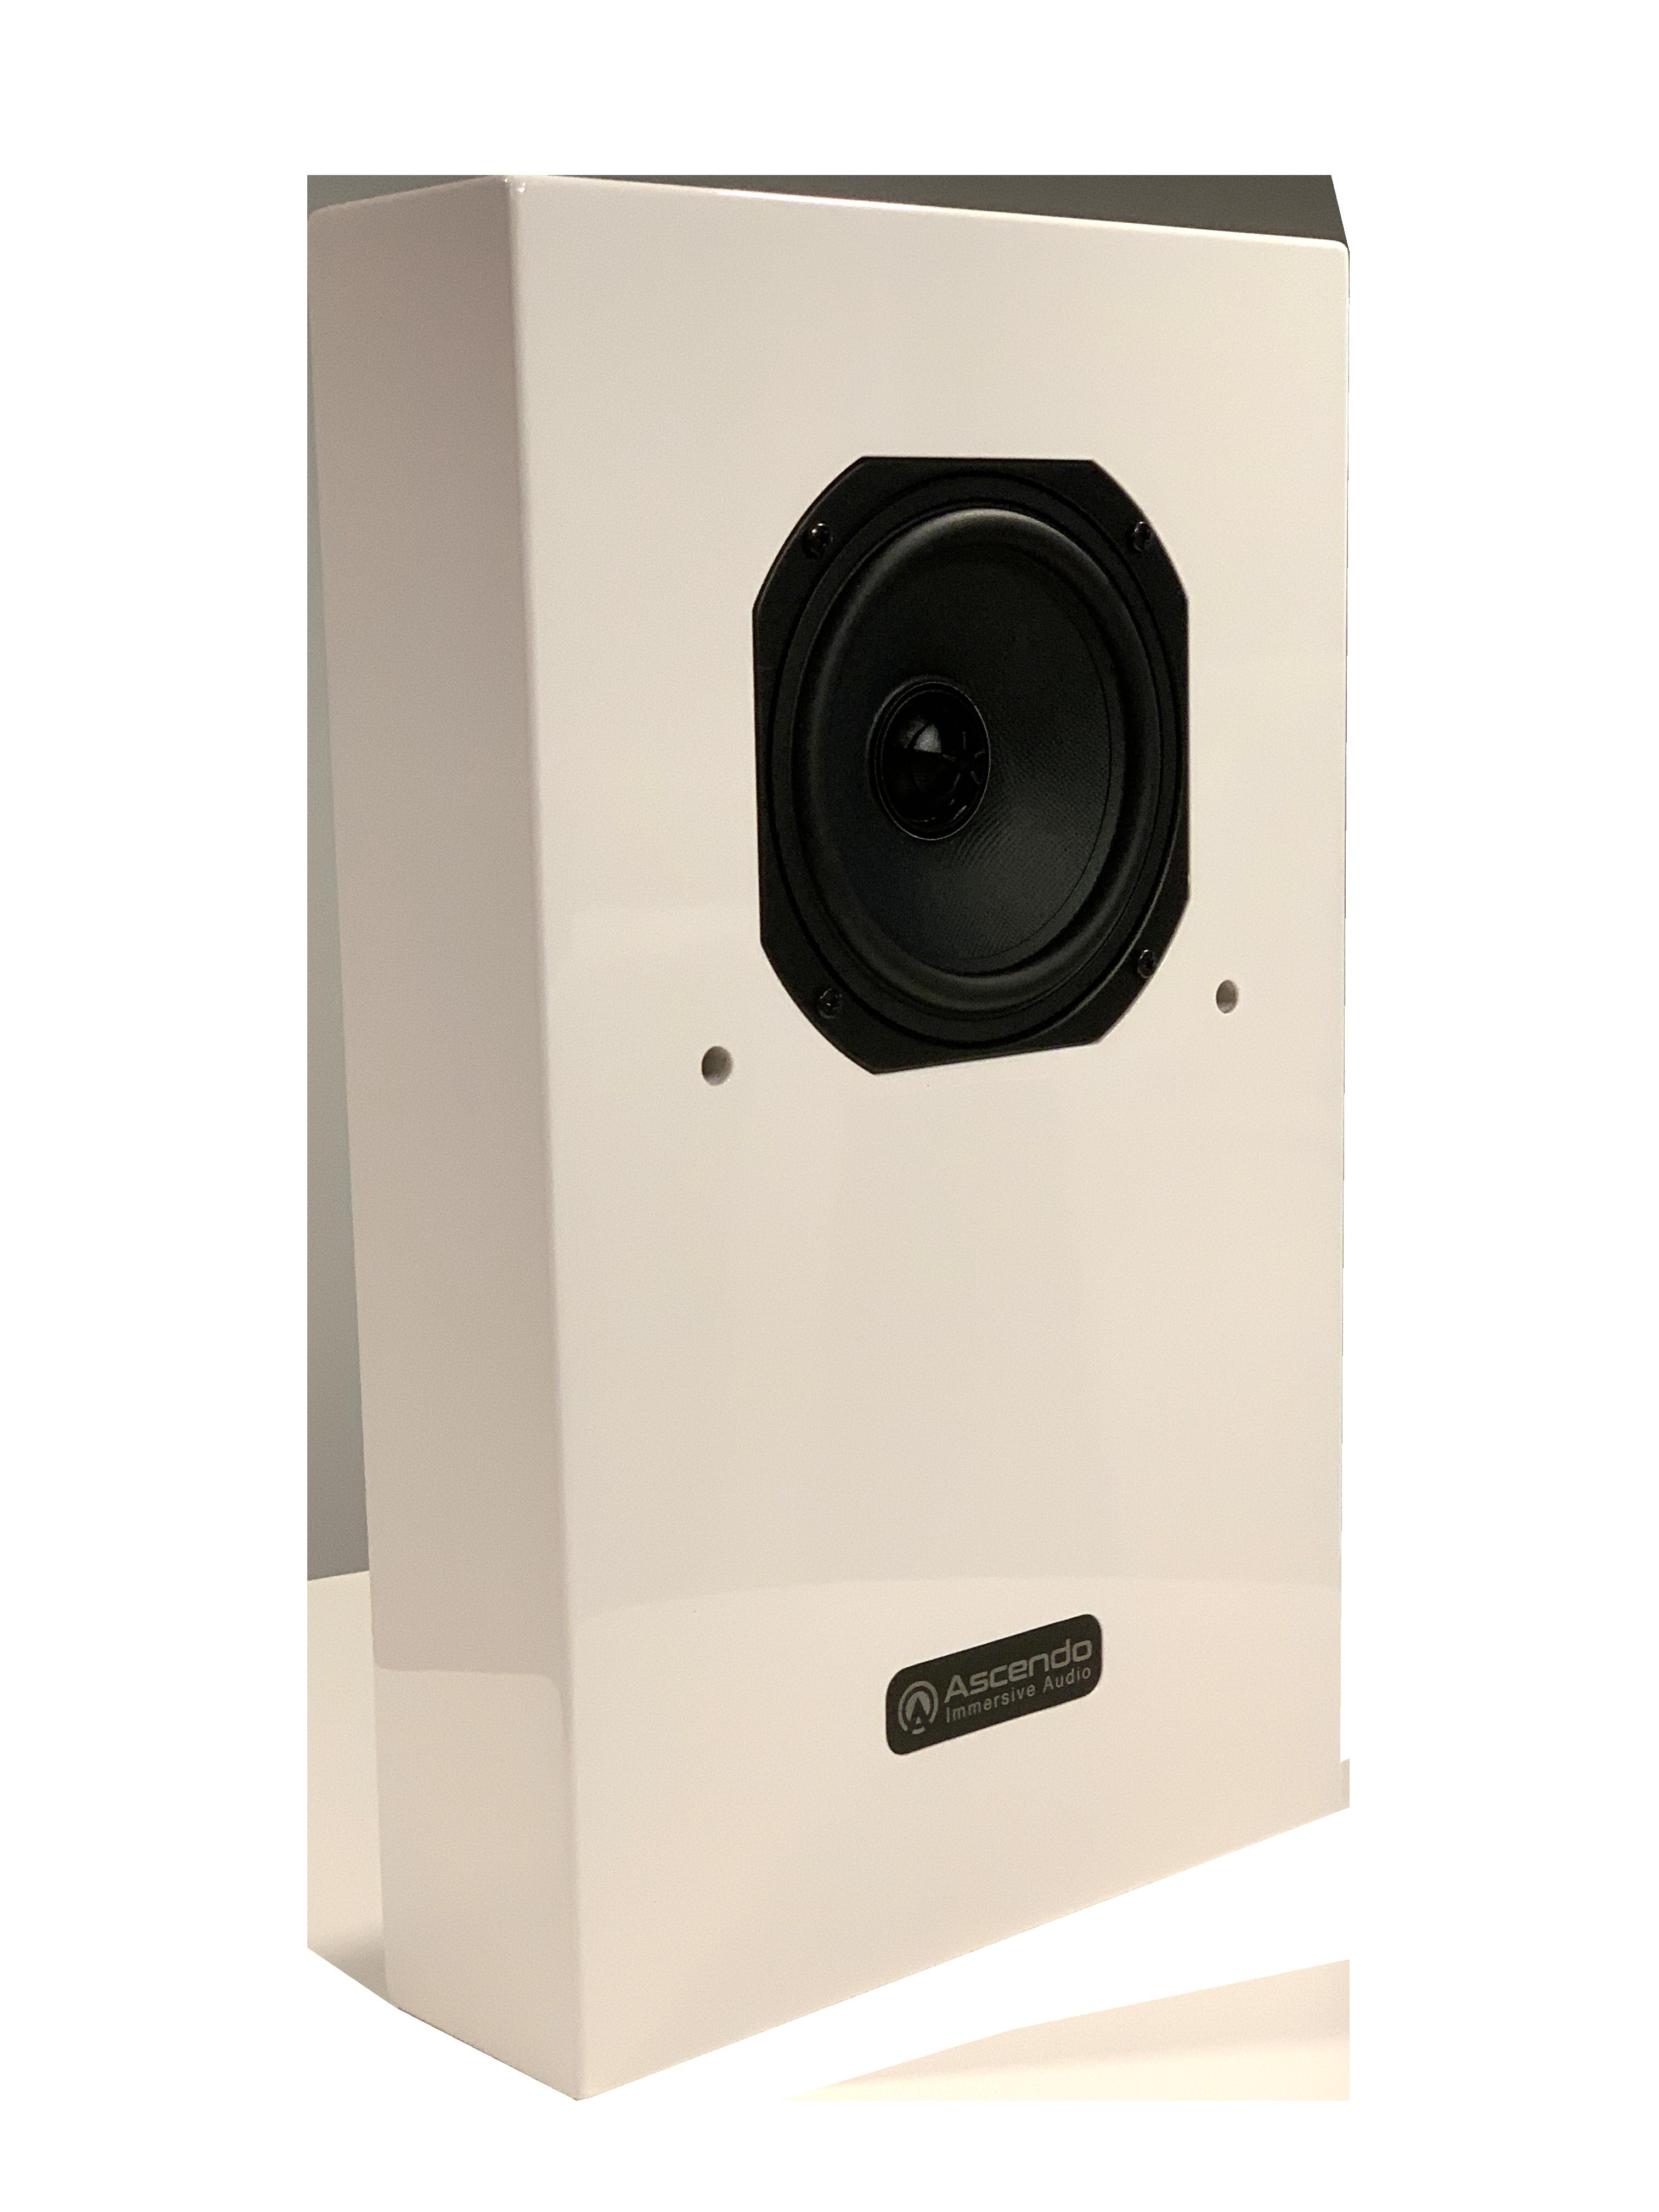 Ascendo Immersive Audio CCM5-P Passive Immersive Audio monitor Glossy White -DEMO / B-VARE!-